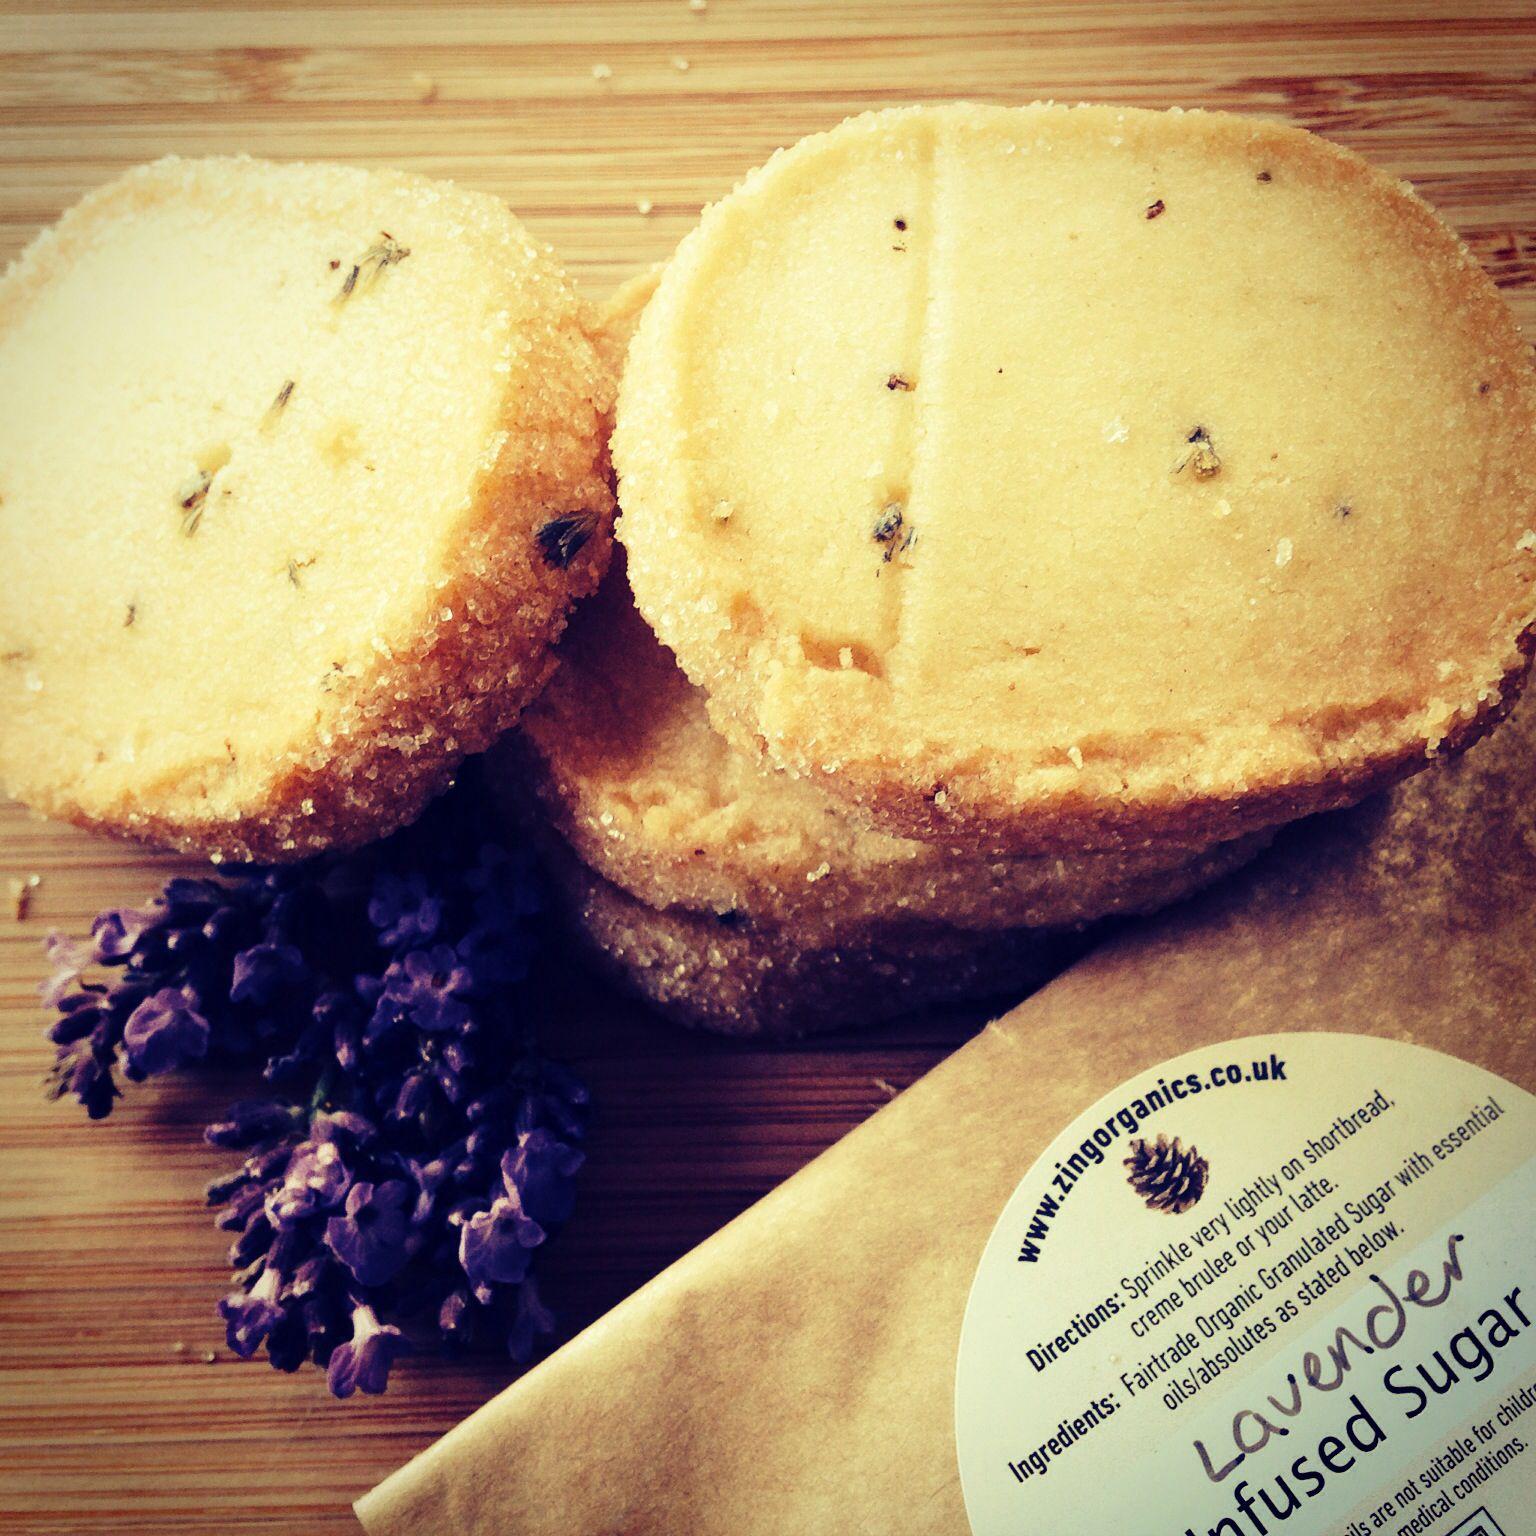 Lavender biscuits, rolled in Zing Organics lavender sugar.